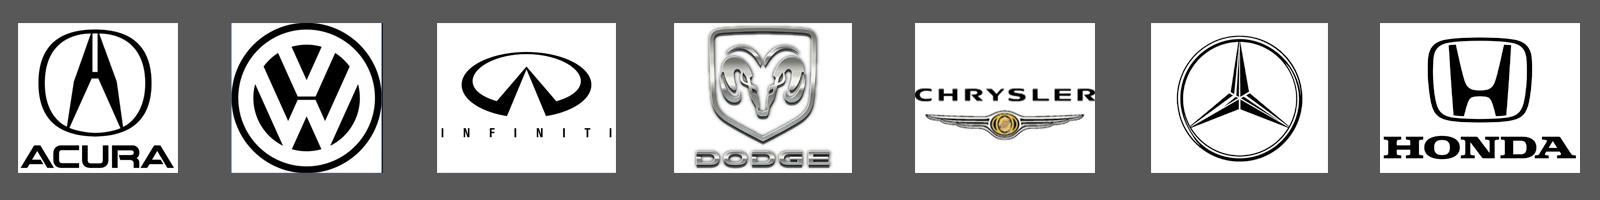 car make symbols - acura, walkswagon, infinity, dodge, chrysler, mercedes, honda